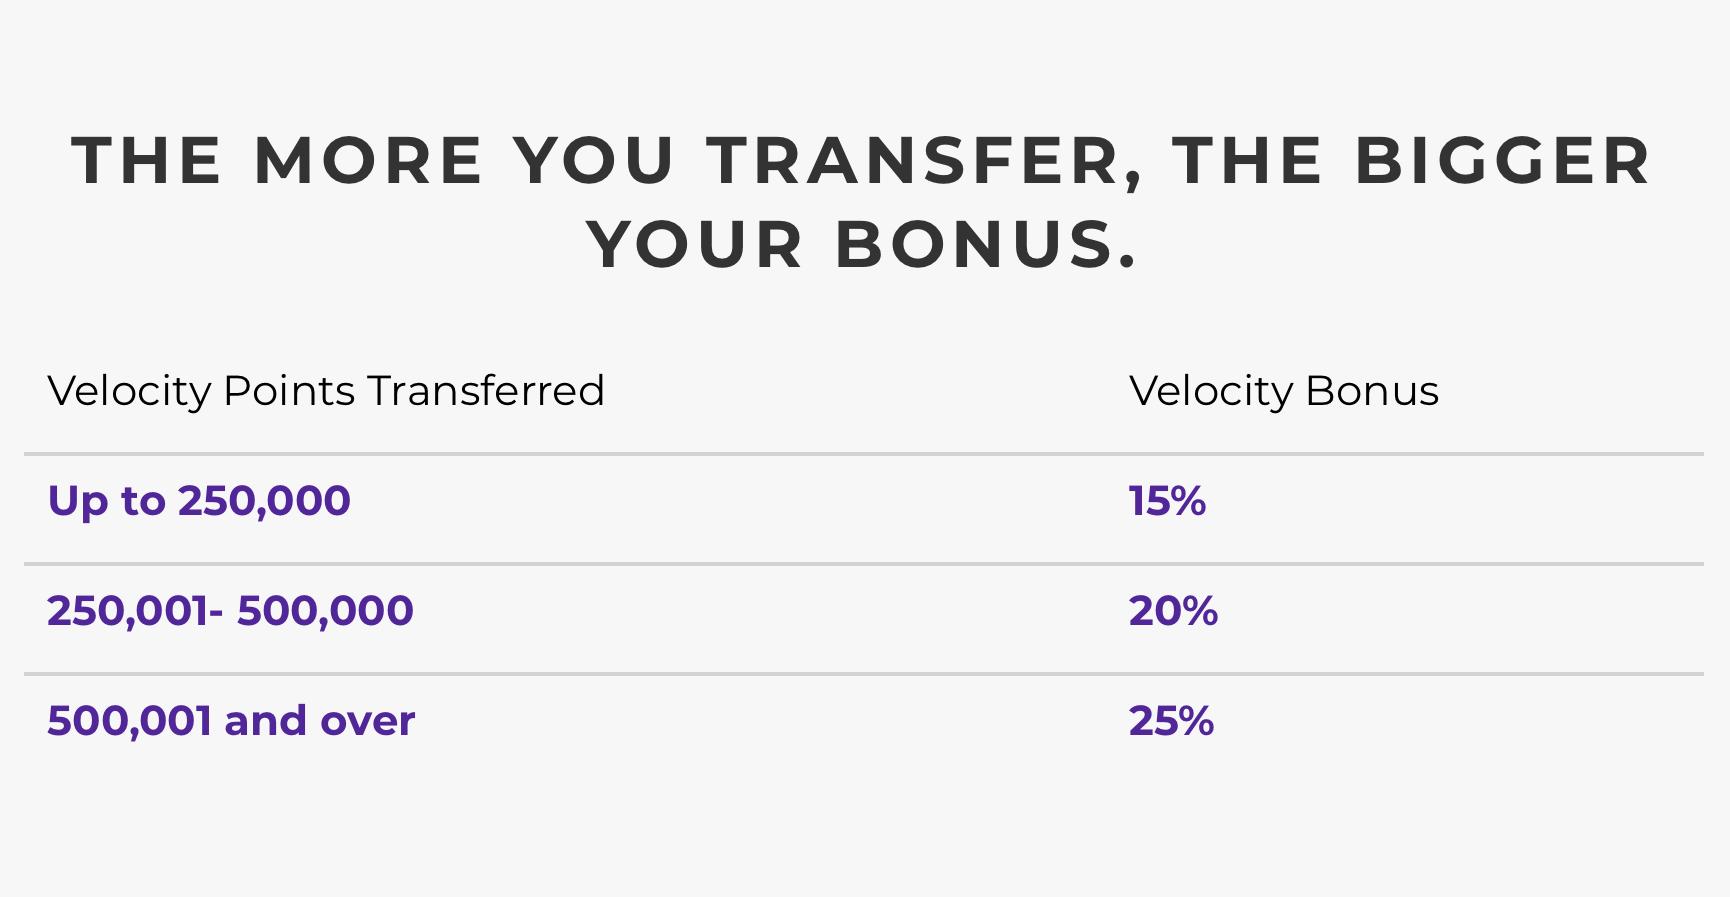 Velocity Tiered Transfer Bonus